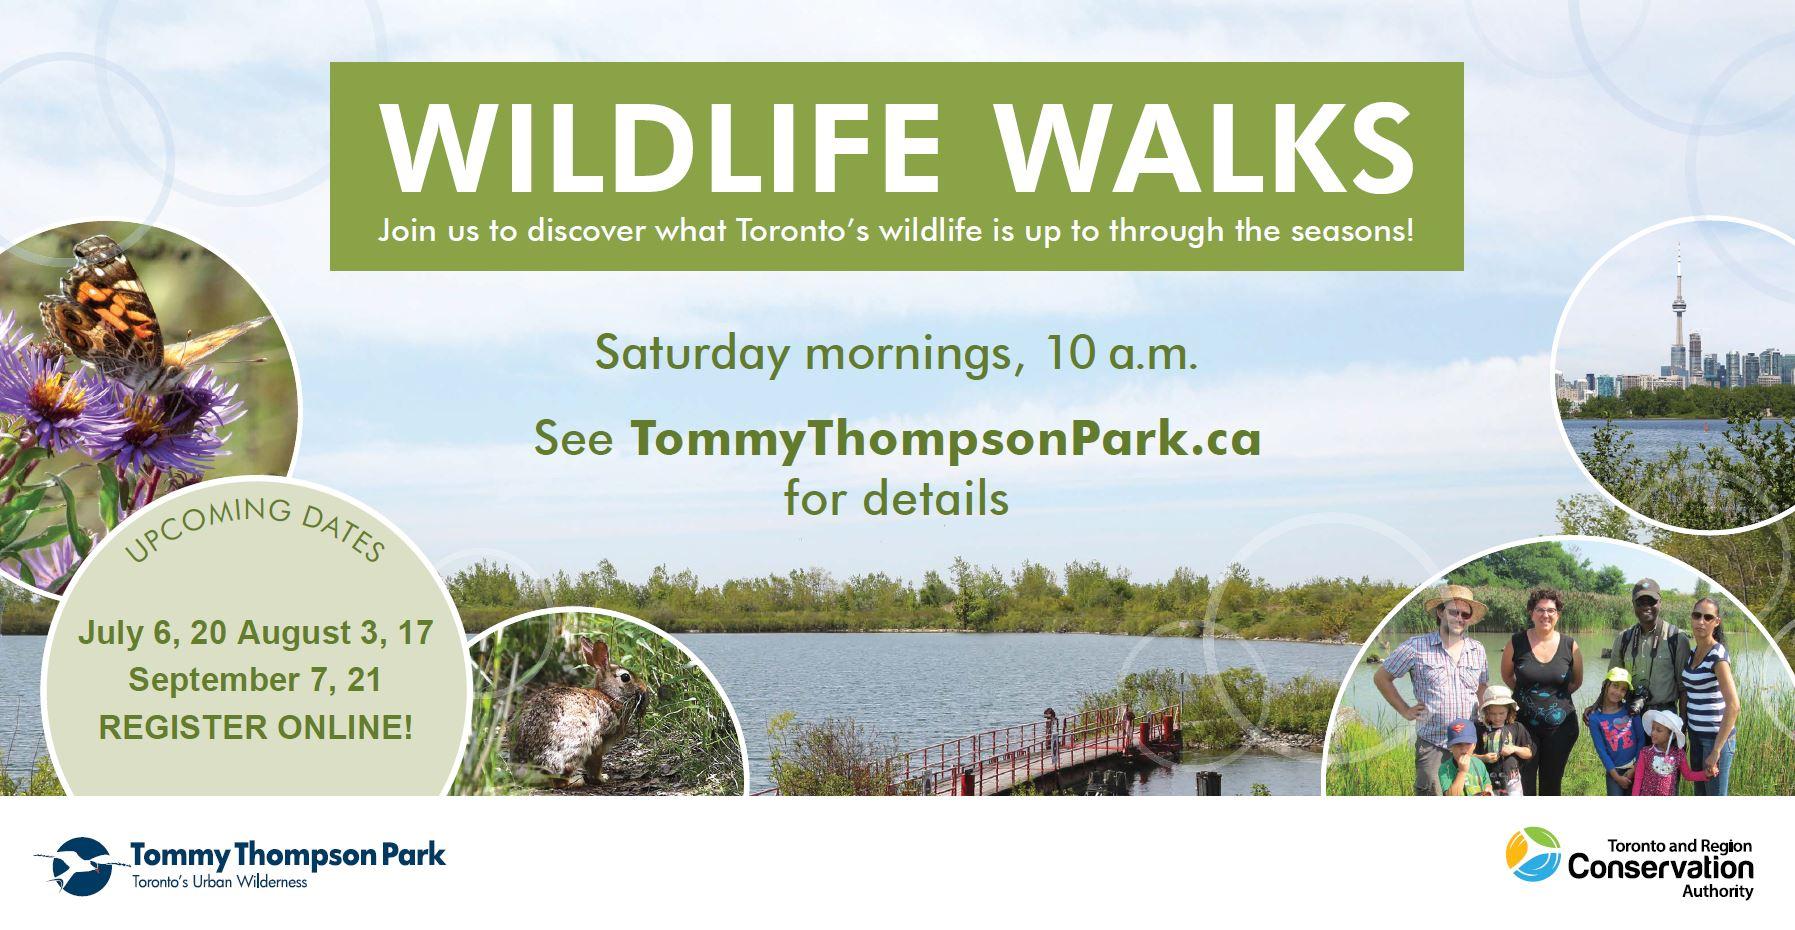 Tommy Thompson Park Wildlife Walks postcard